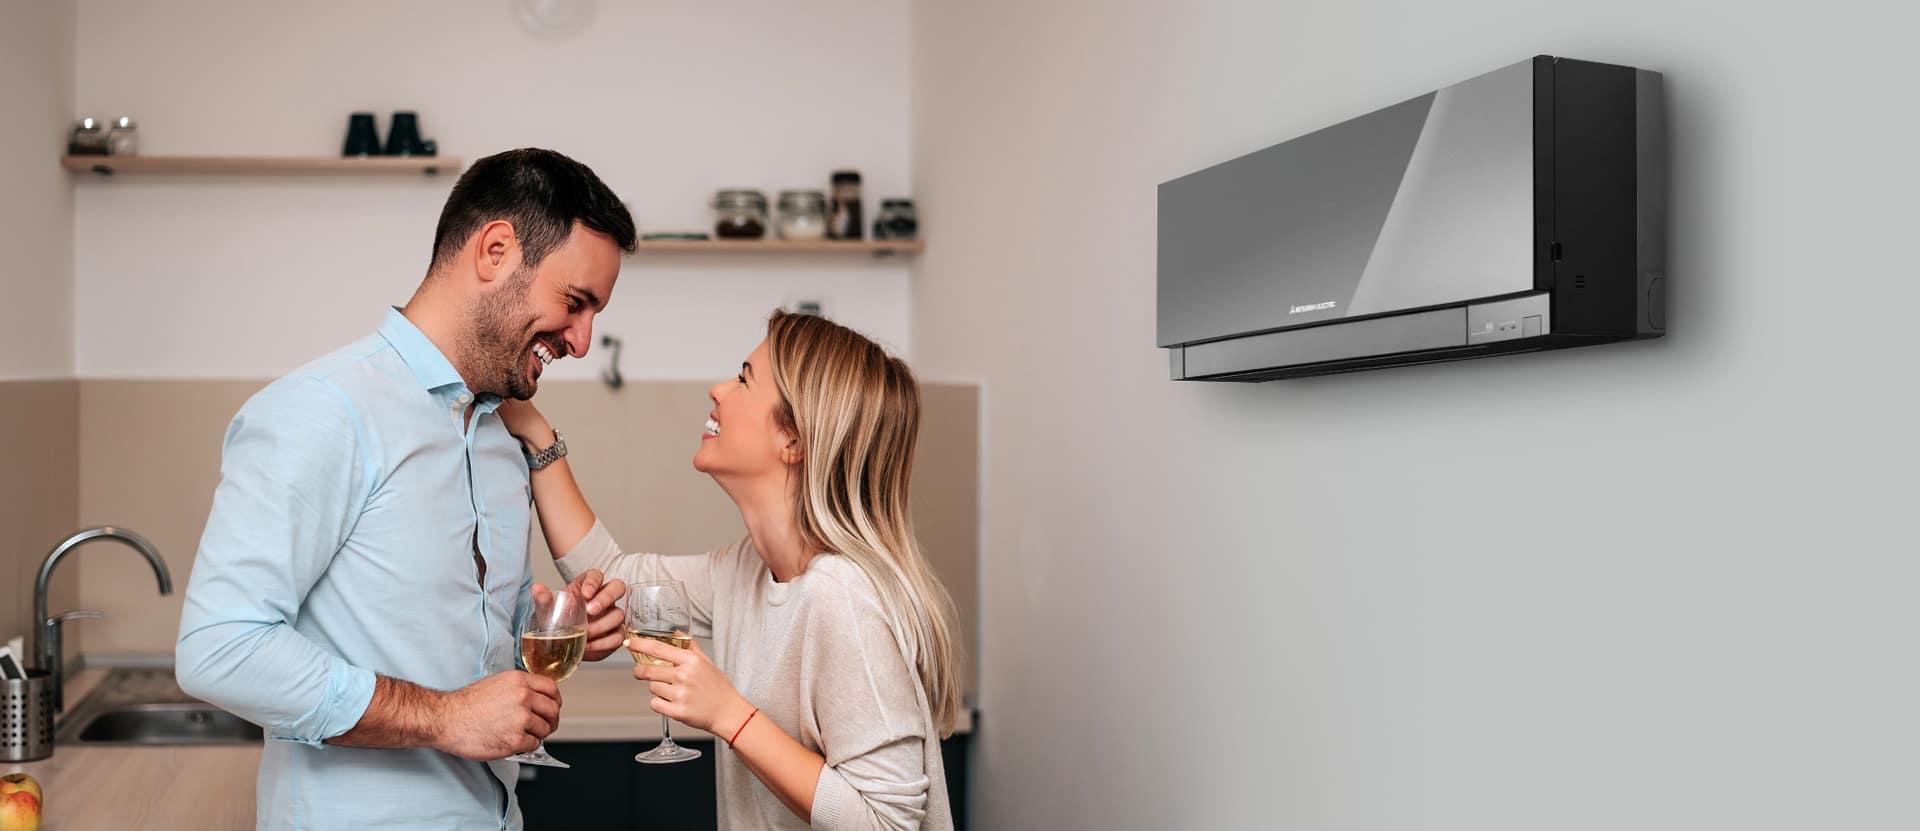 Vesel par v kuhinji s klimatsko napravo Mitsubishi Electric